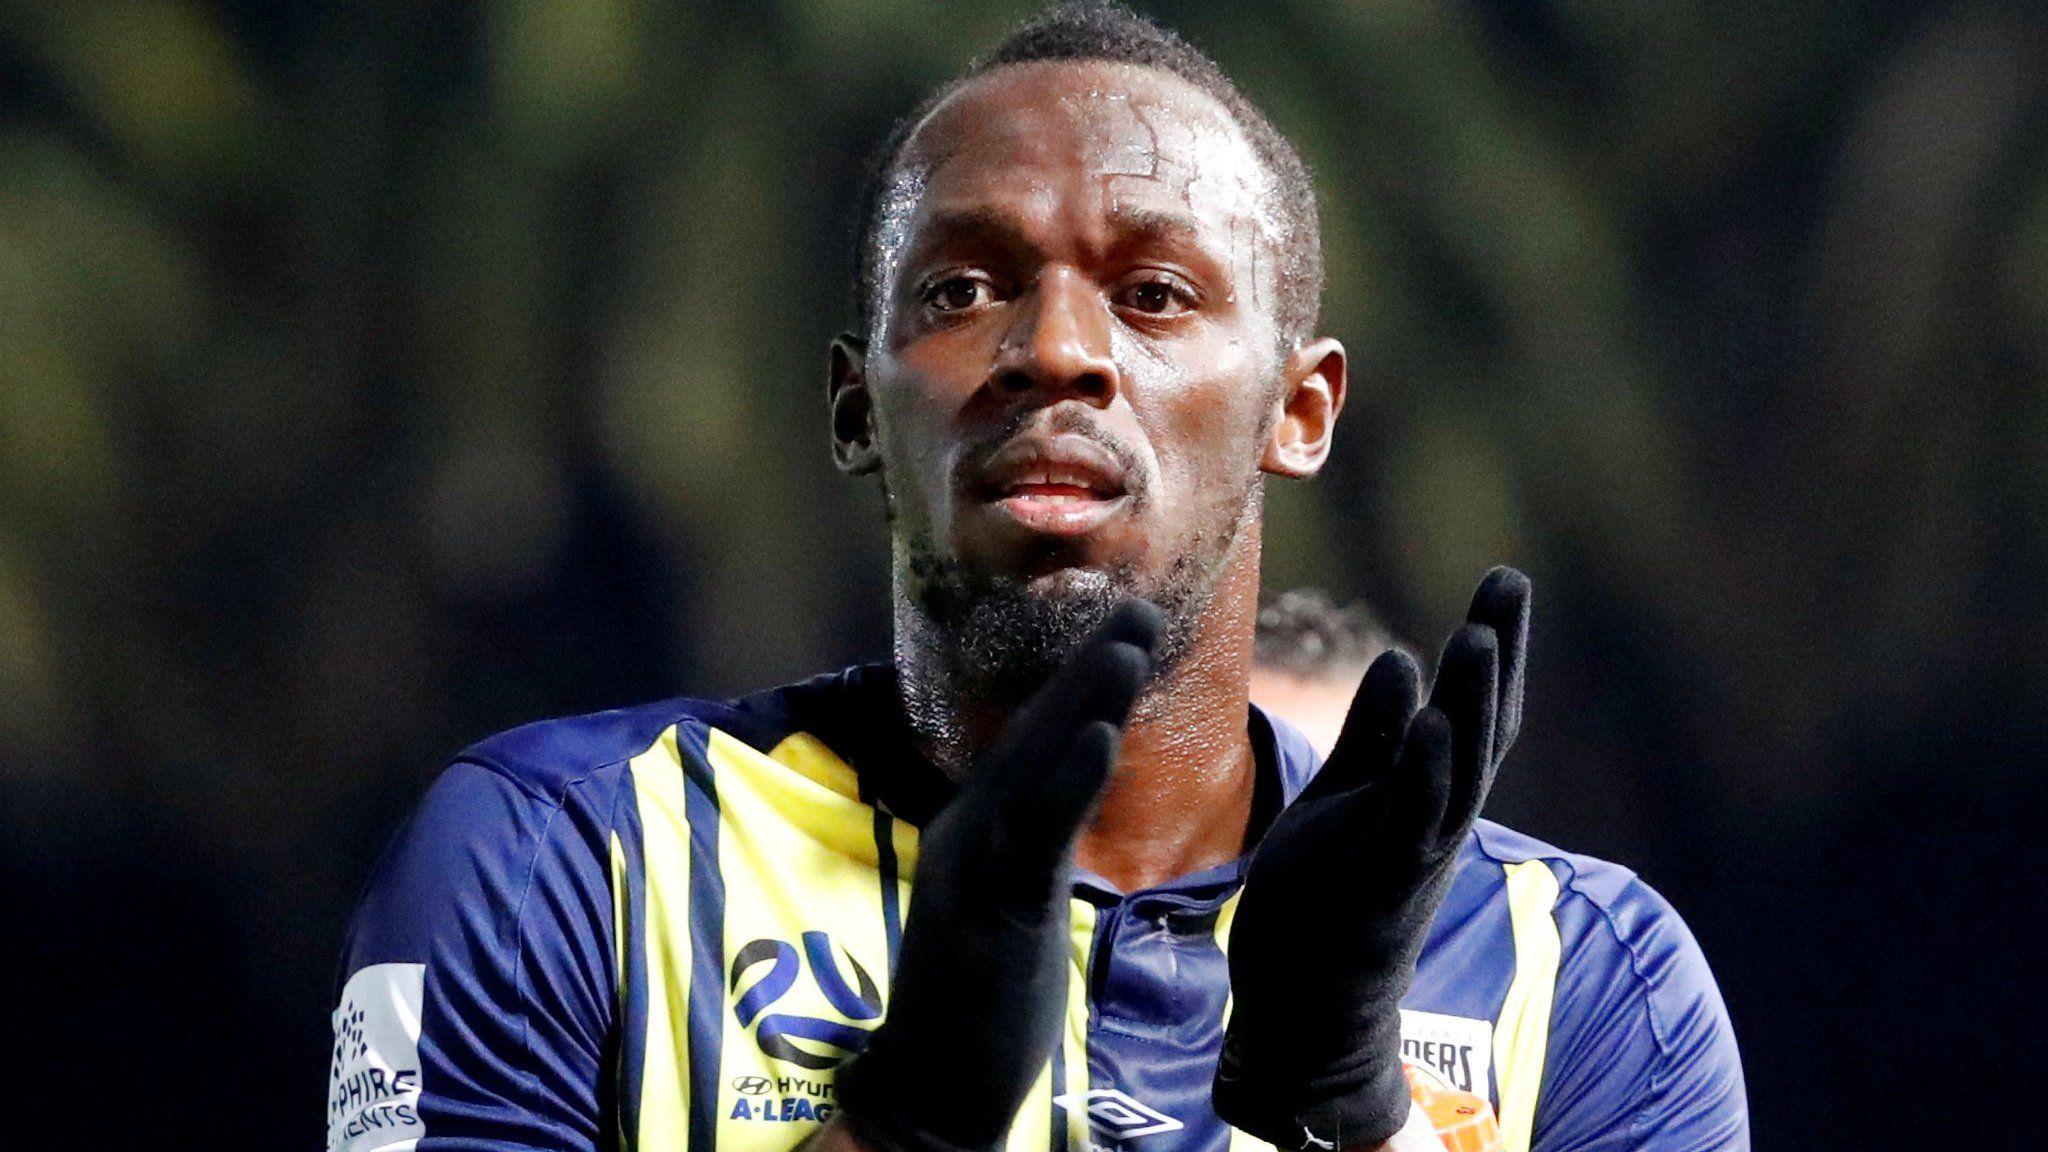 Usain Bolt Eighttime Olympic champion 'turns down